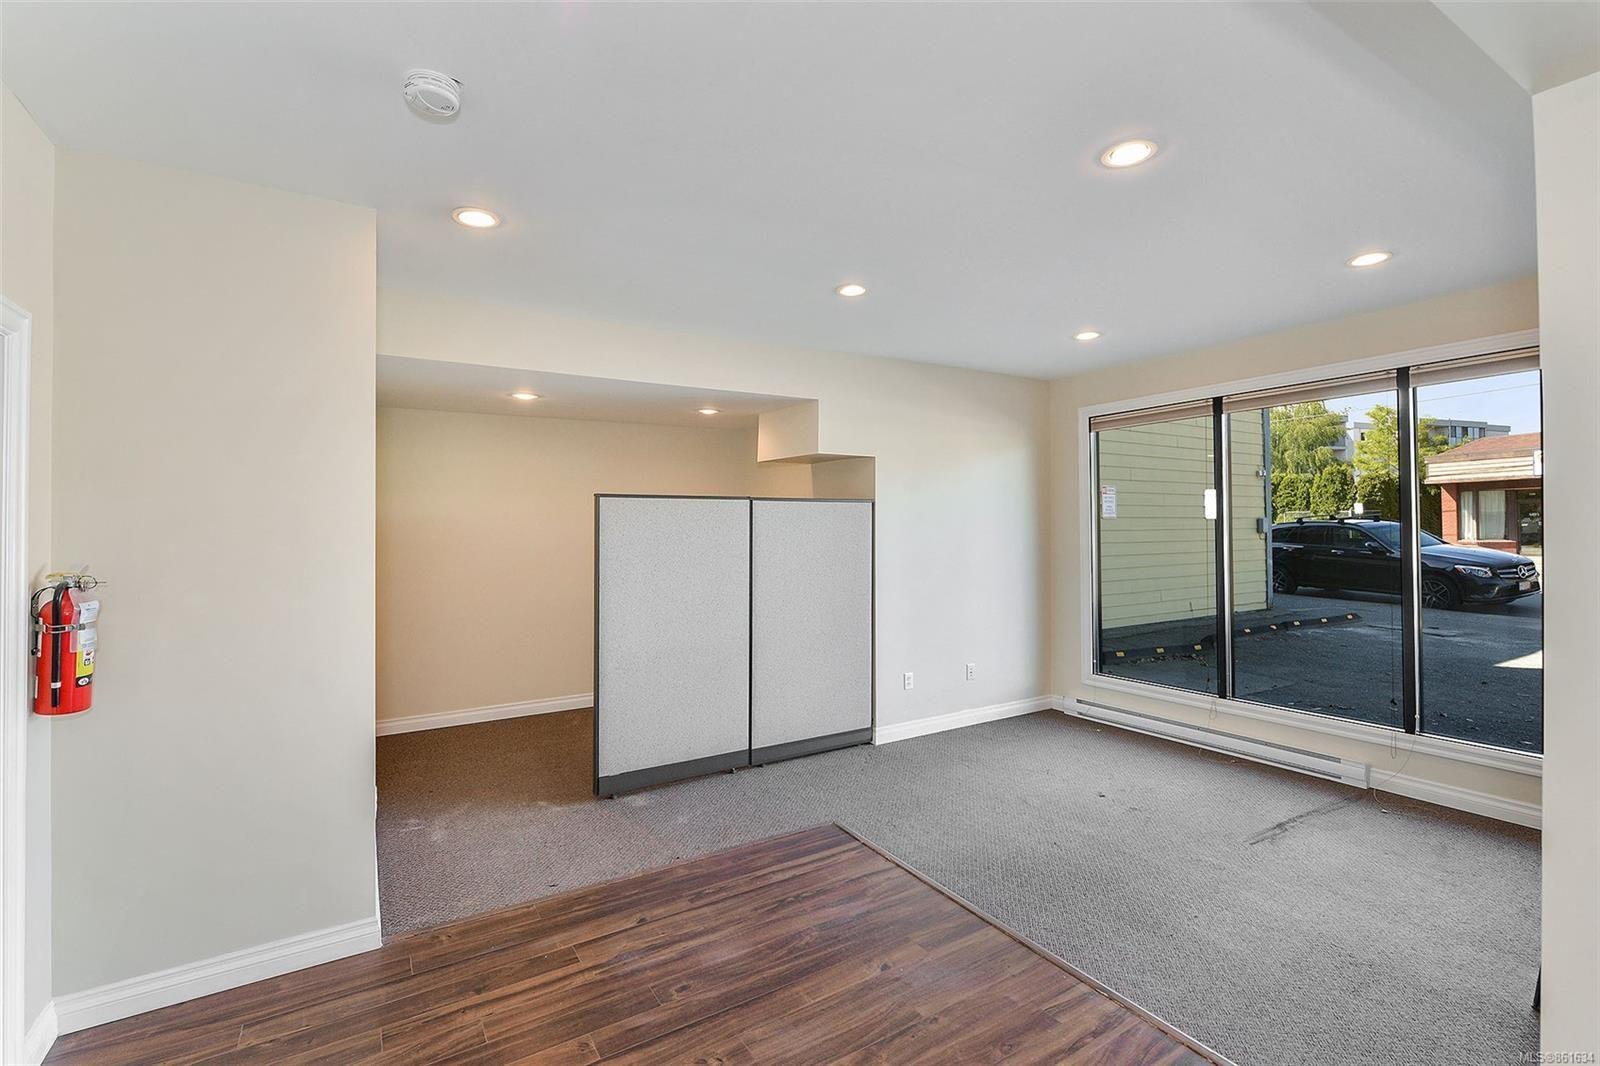 Photo 11: Photos: 367 E Burnside Rd in : Vi Burnside Quadruplex for sale (Victoria)  : MLS®# 861634